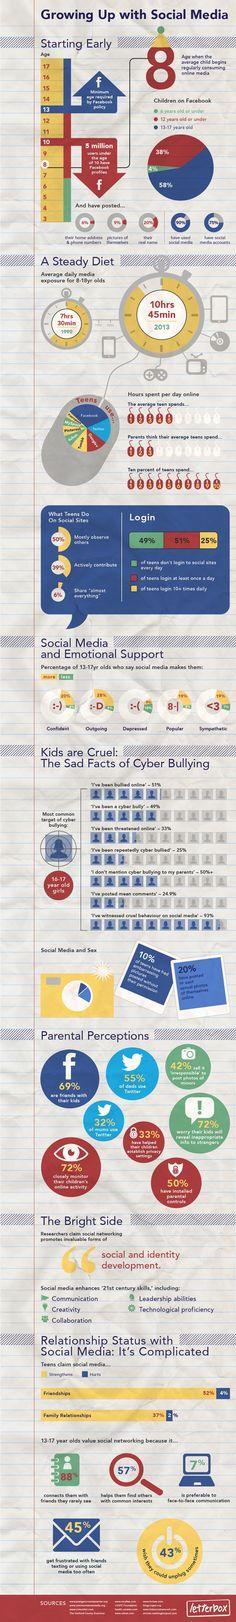 #Socialmedia use #infographic,